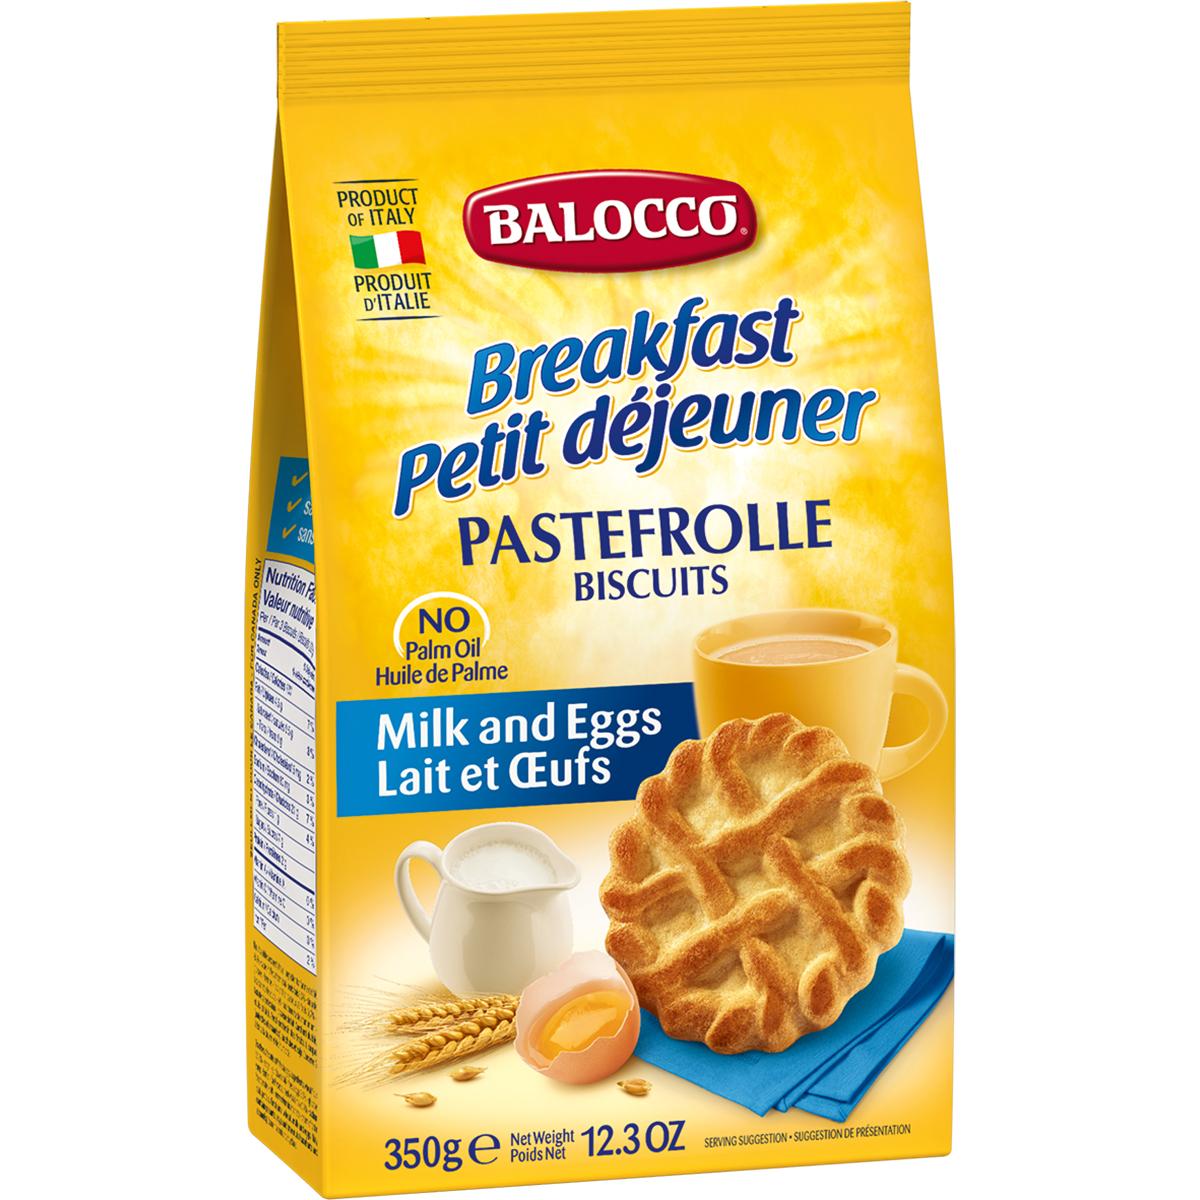 Biscuiti cu lapte si ou Balocco Pastefrolle, 350 g imagine